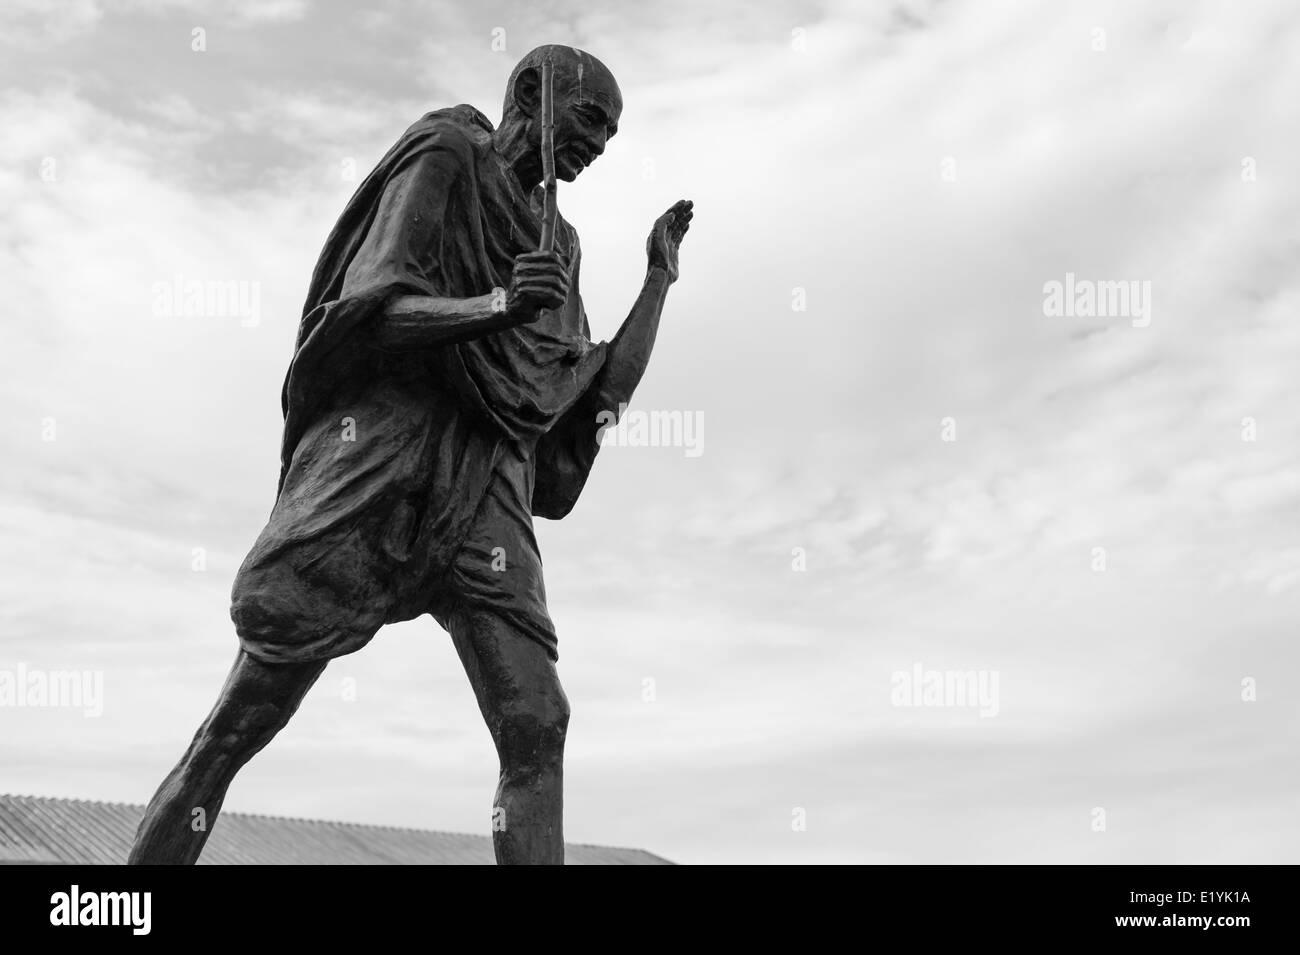 Gandhi Statue, San Francisco - Stock Image